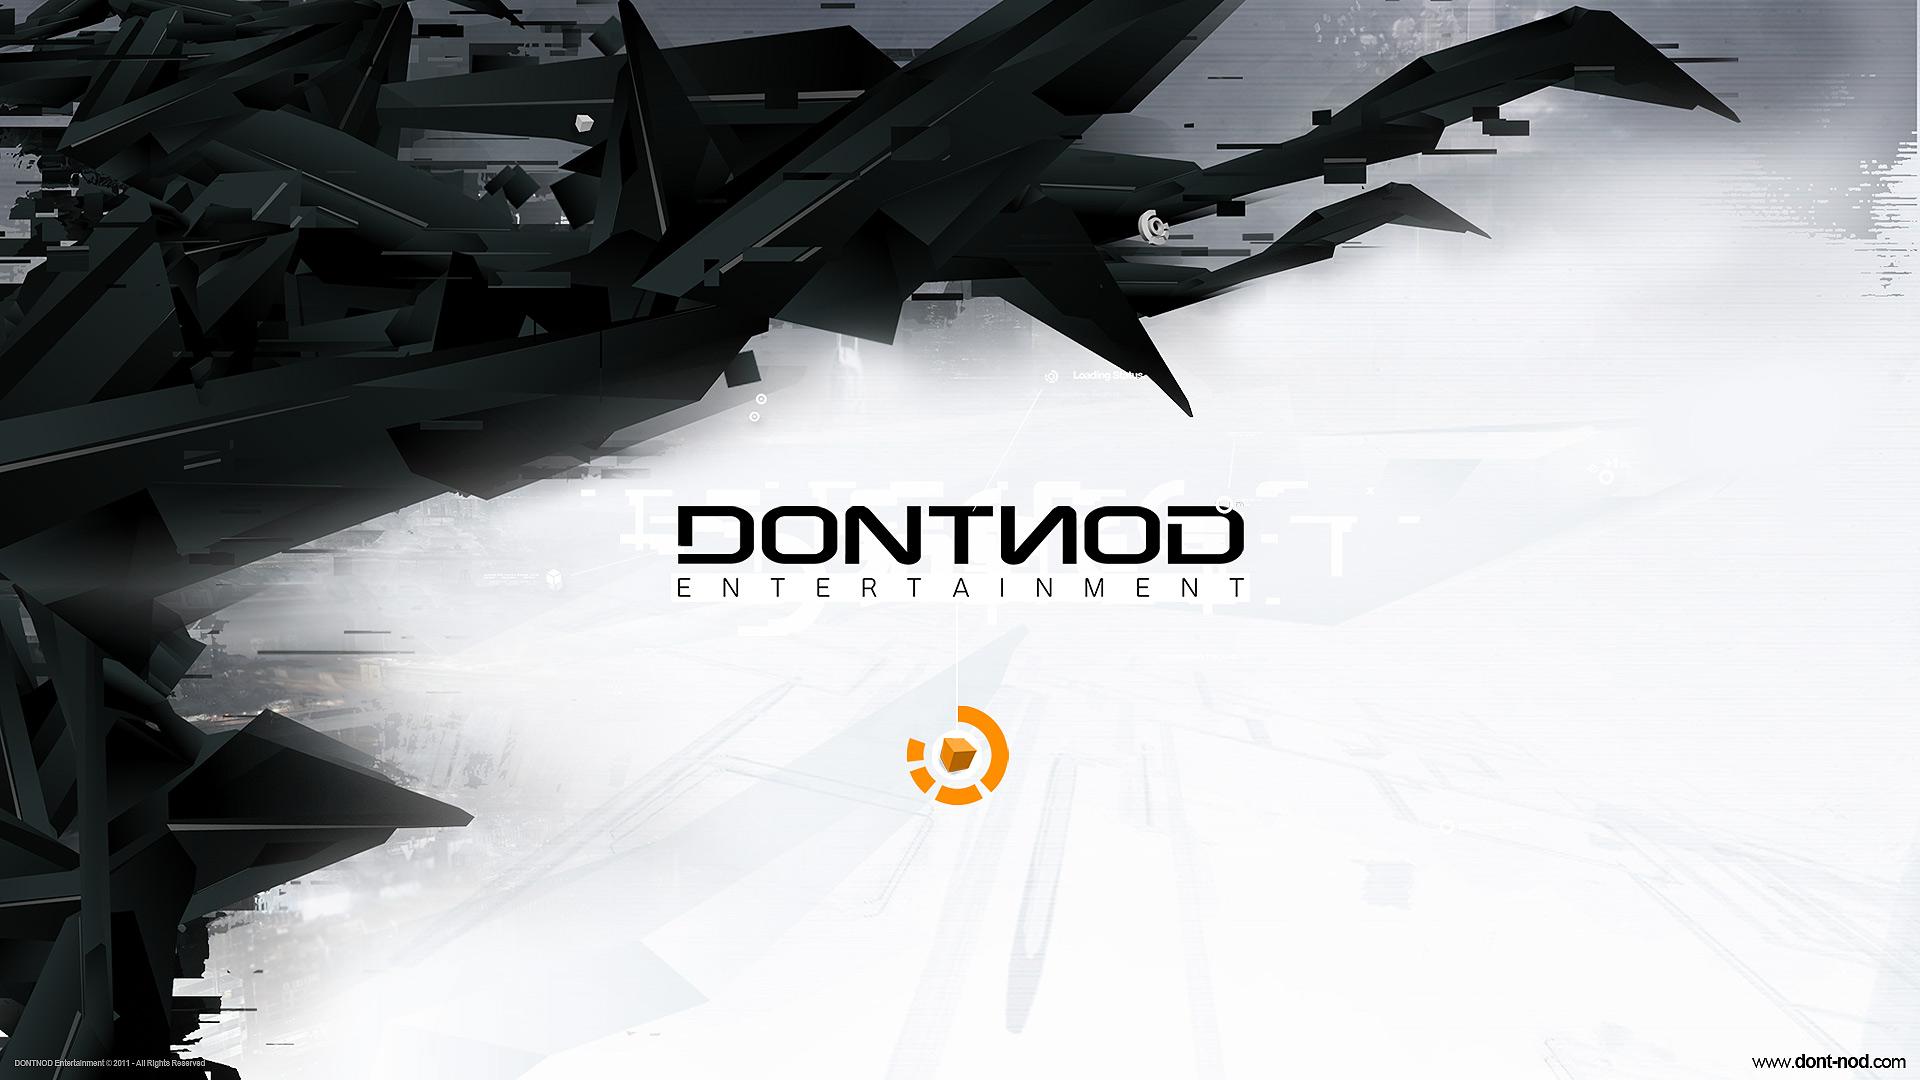 DONTNOD